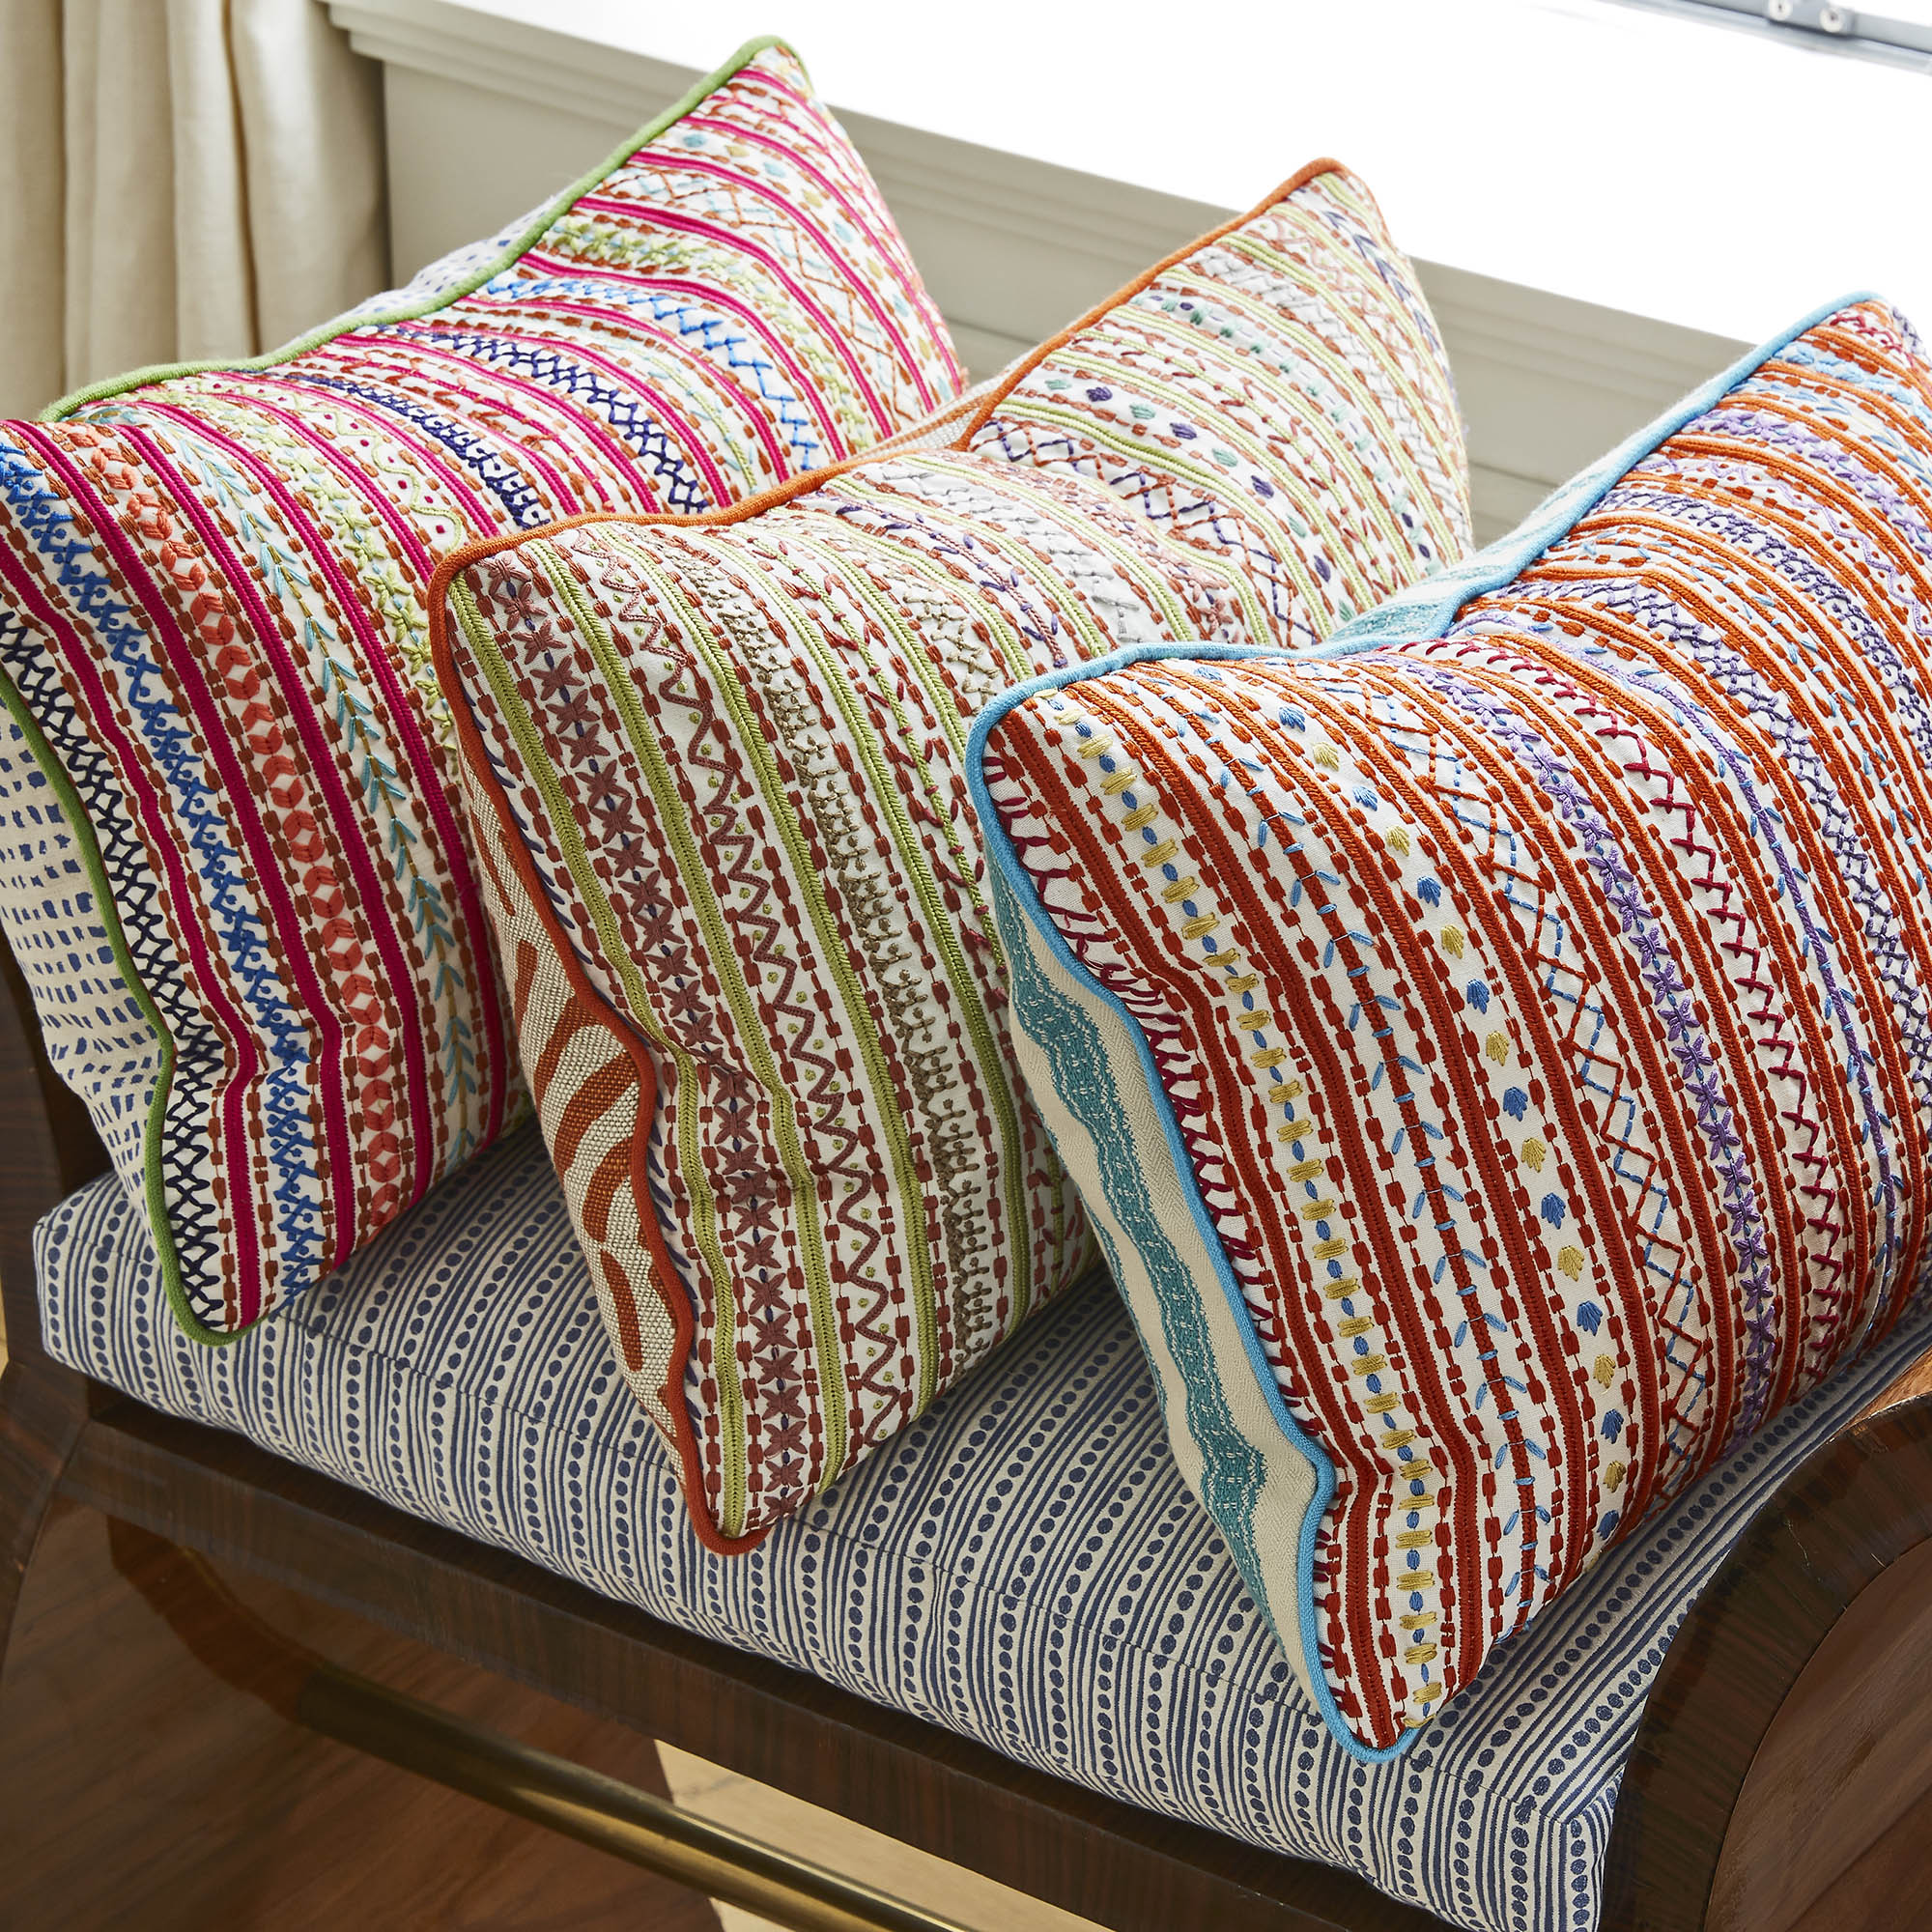 capri_cushions.jpg